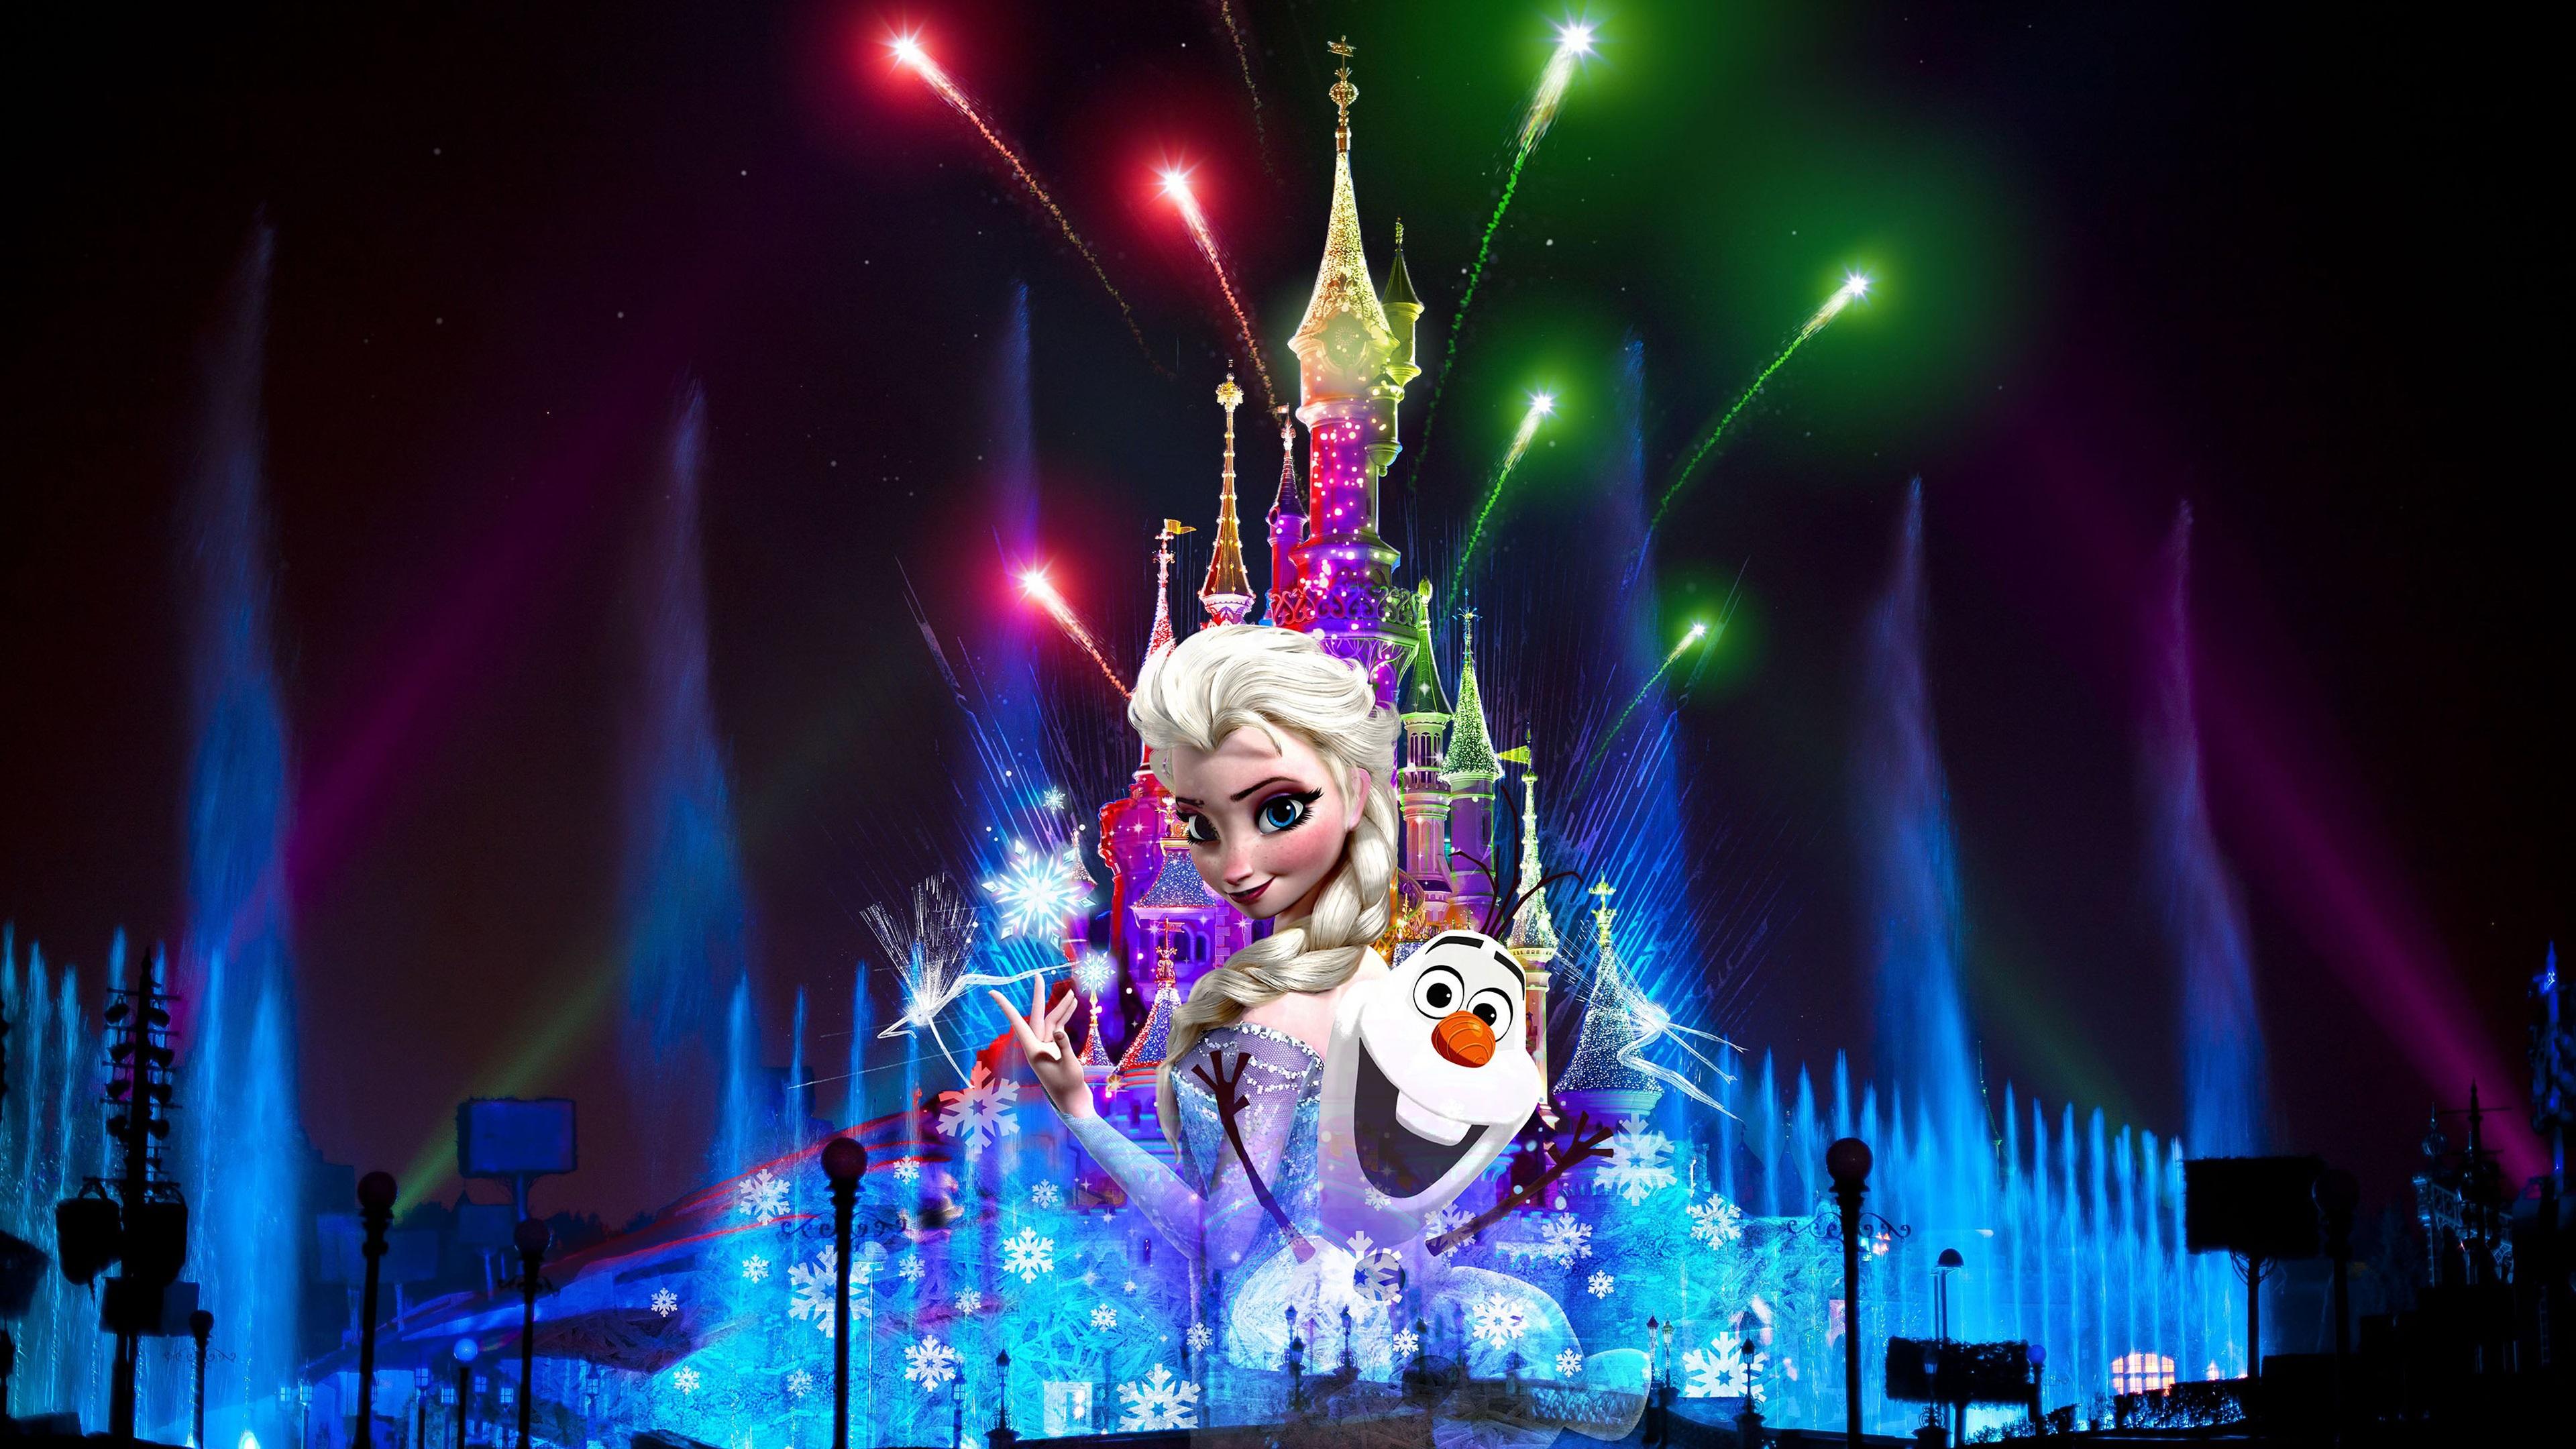 France Paris Disneyland at night beautiful fireworks